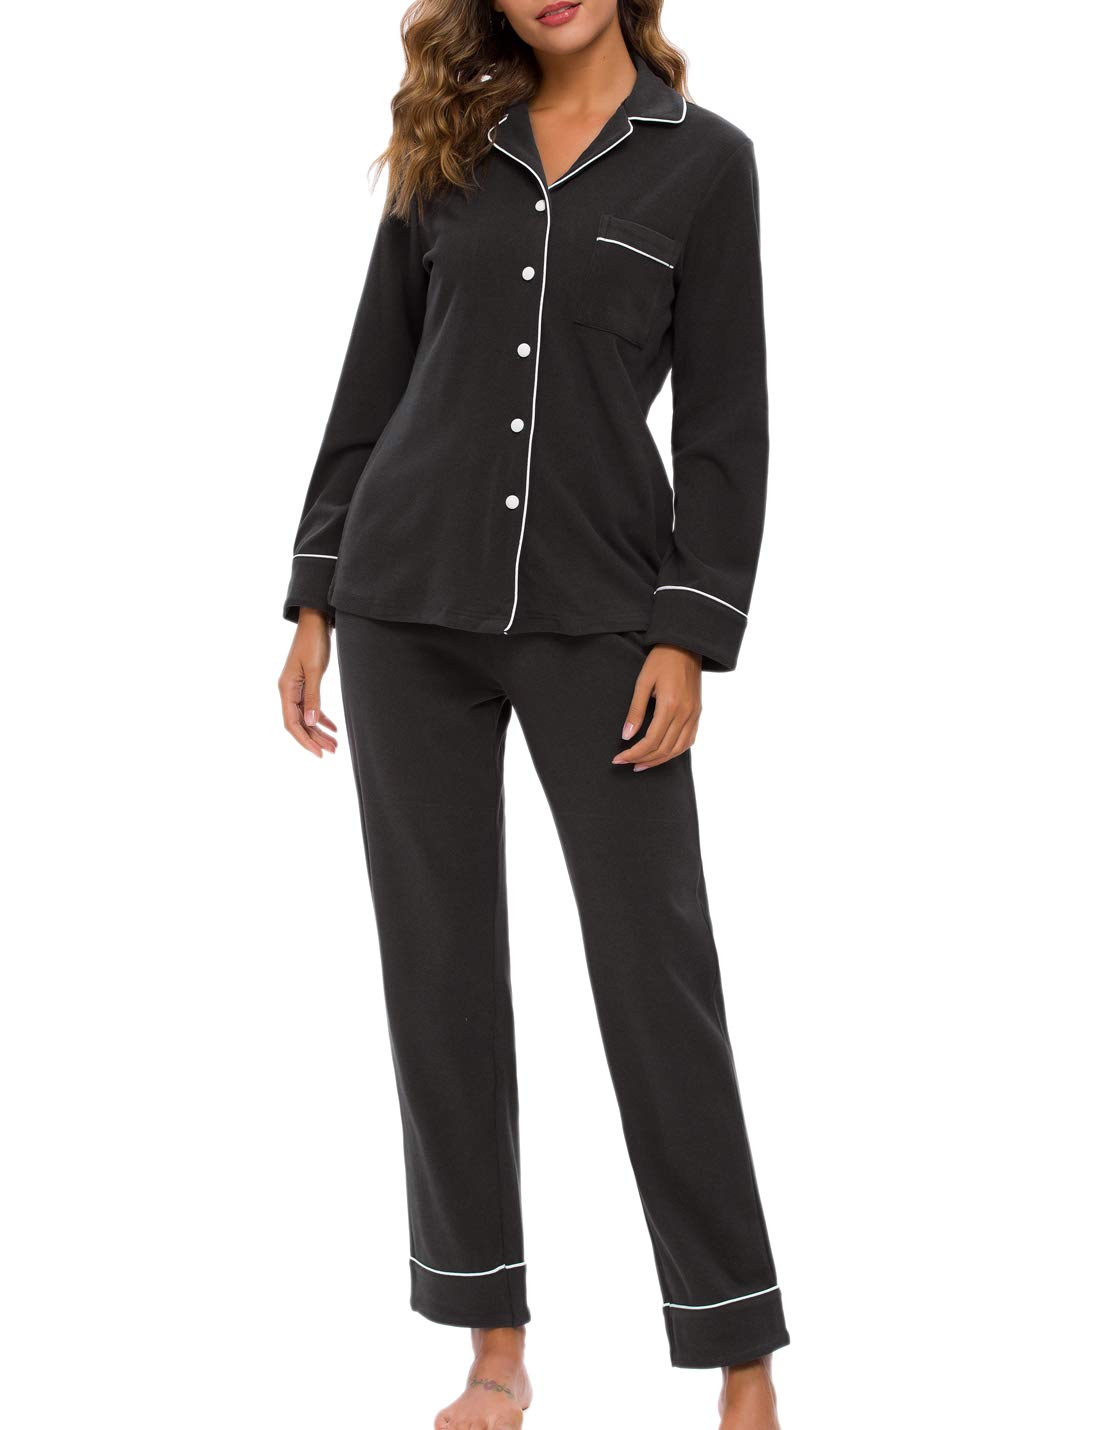 RIKILIO Cozy Fleece Pajama Set Womens Button Down Sleepwear Long Sleeve Lounge PJS XS-XL